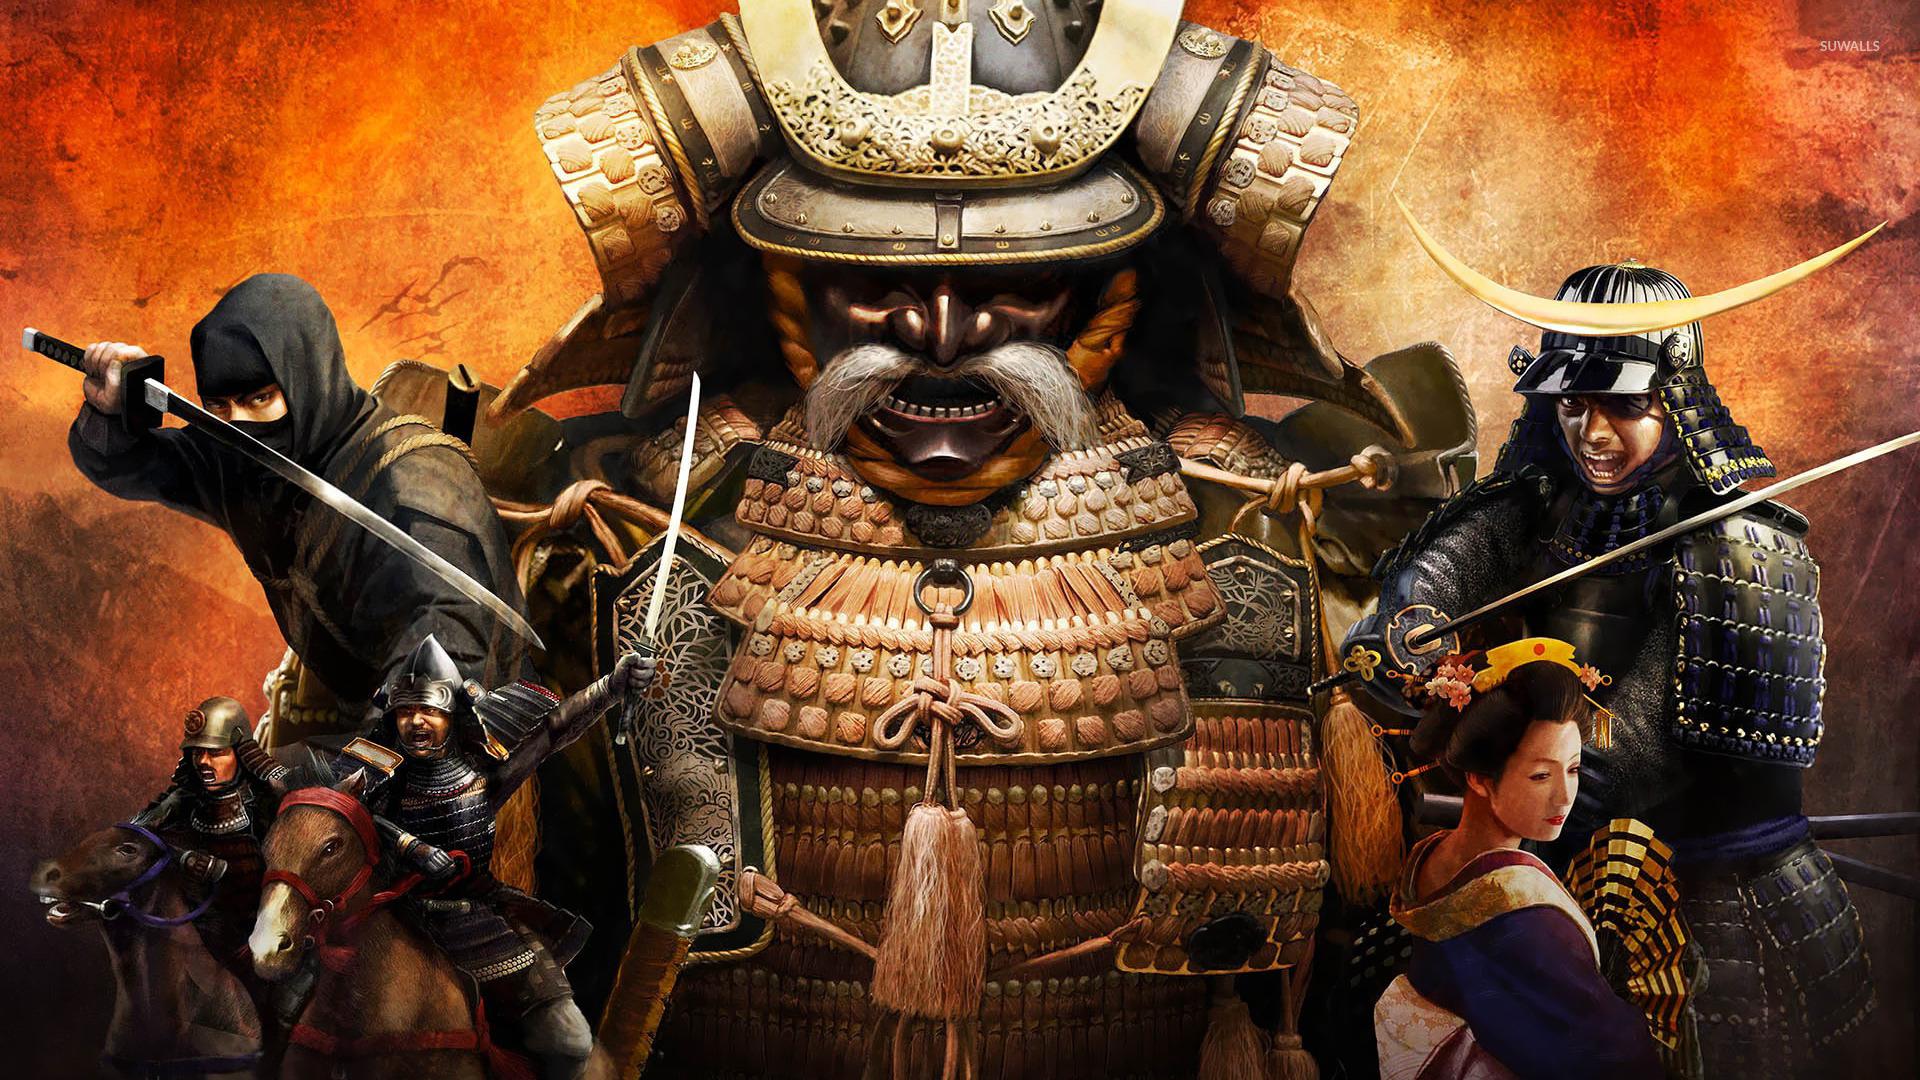 Shogun 2 Fall Of The Samurai Wallpaper Total War Shogun 2 Wallpaper Game Wallpapers 17013